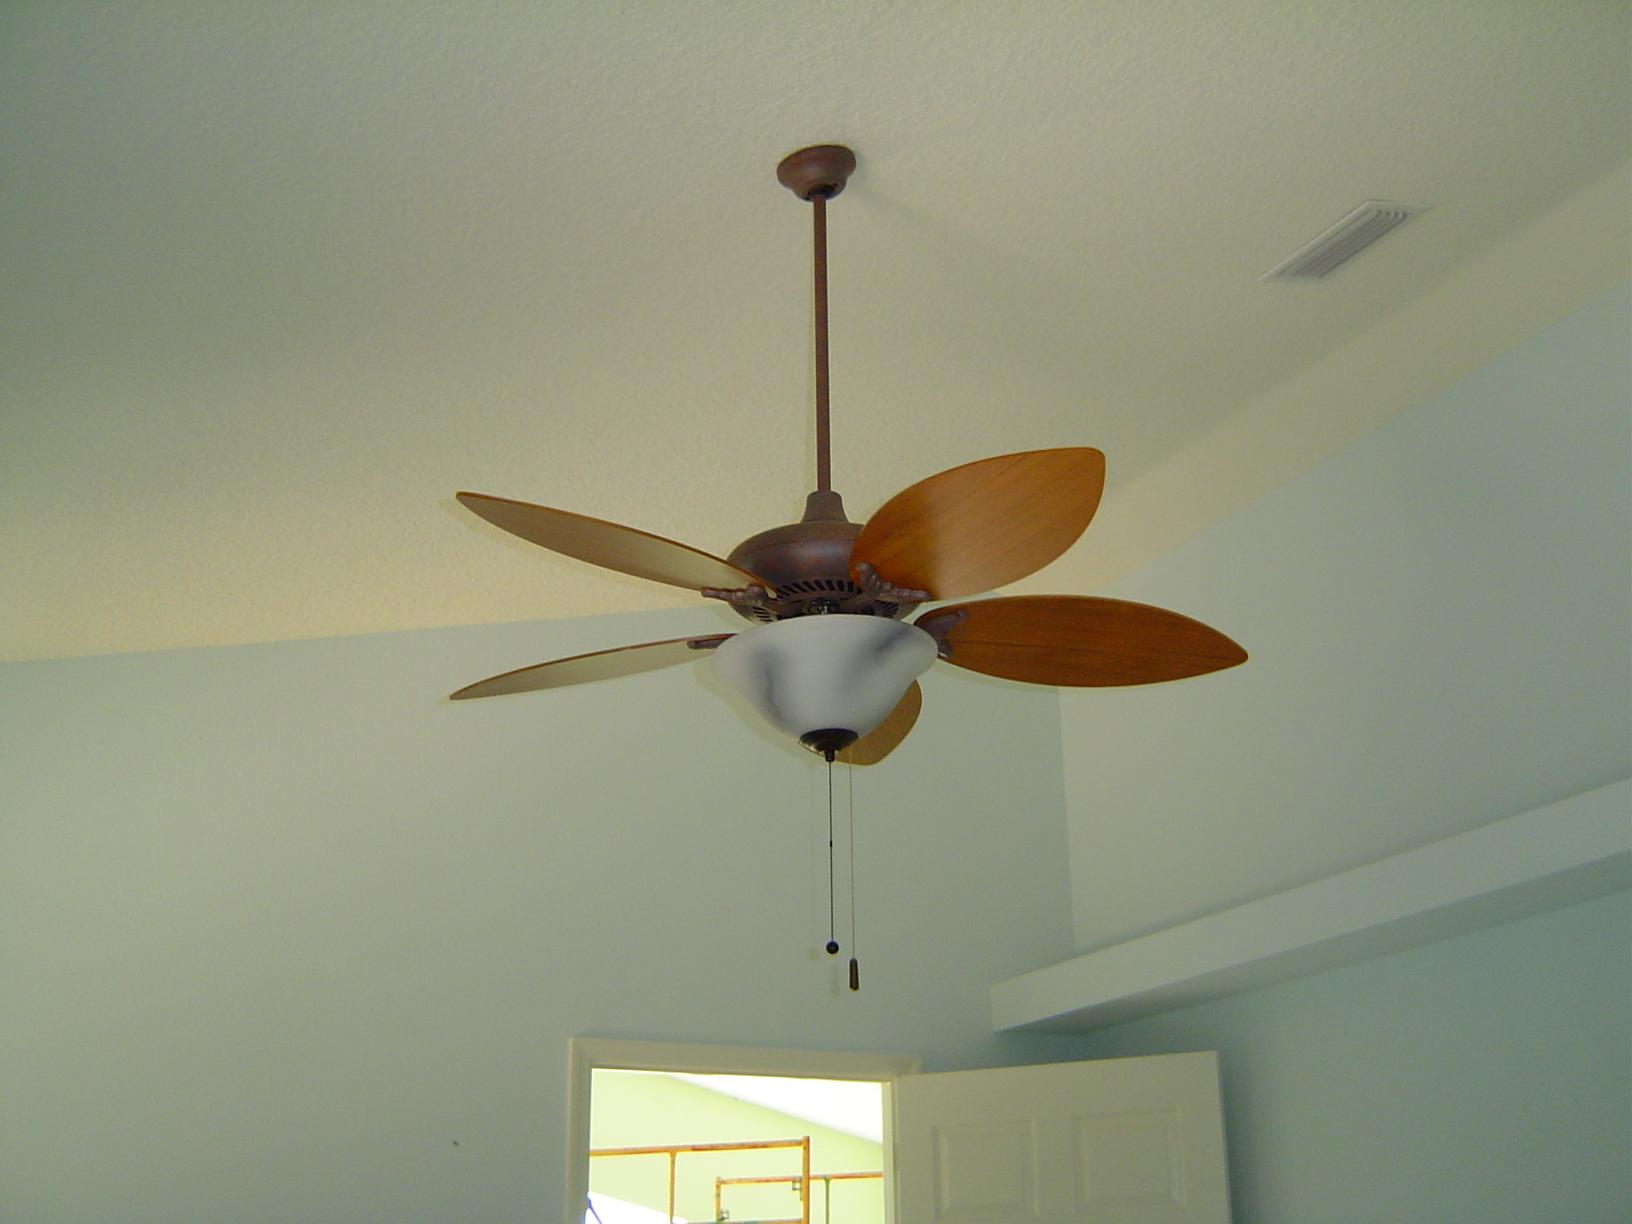 Citrus County Ceiling Fan & Lighting Installation